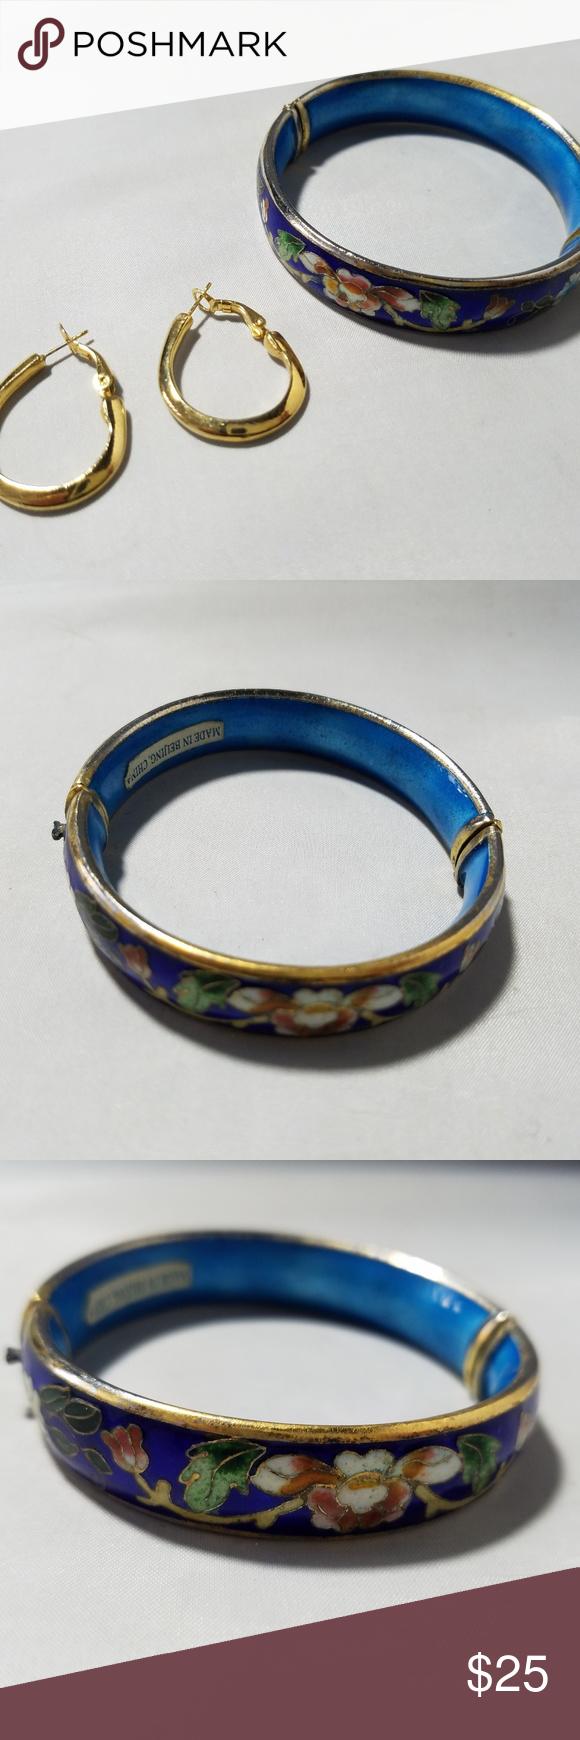 Vintage gold tone blue enamel bangle u earrings my posh picks